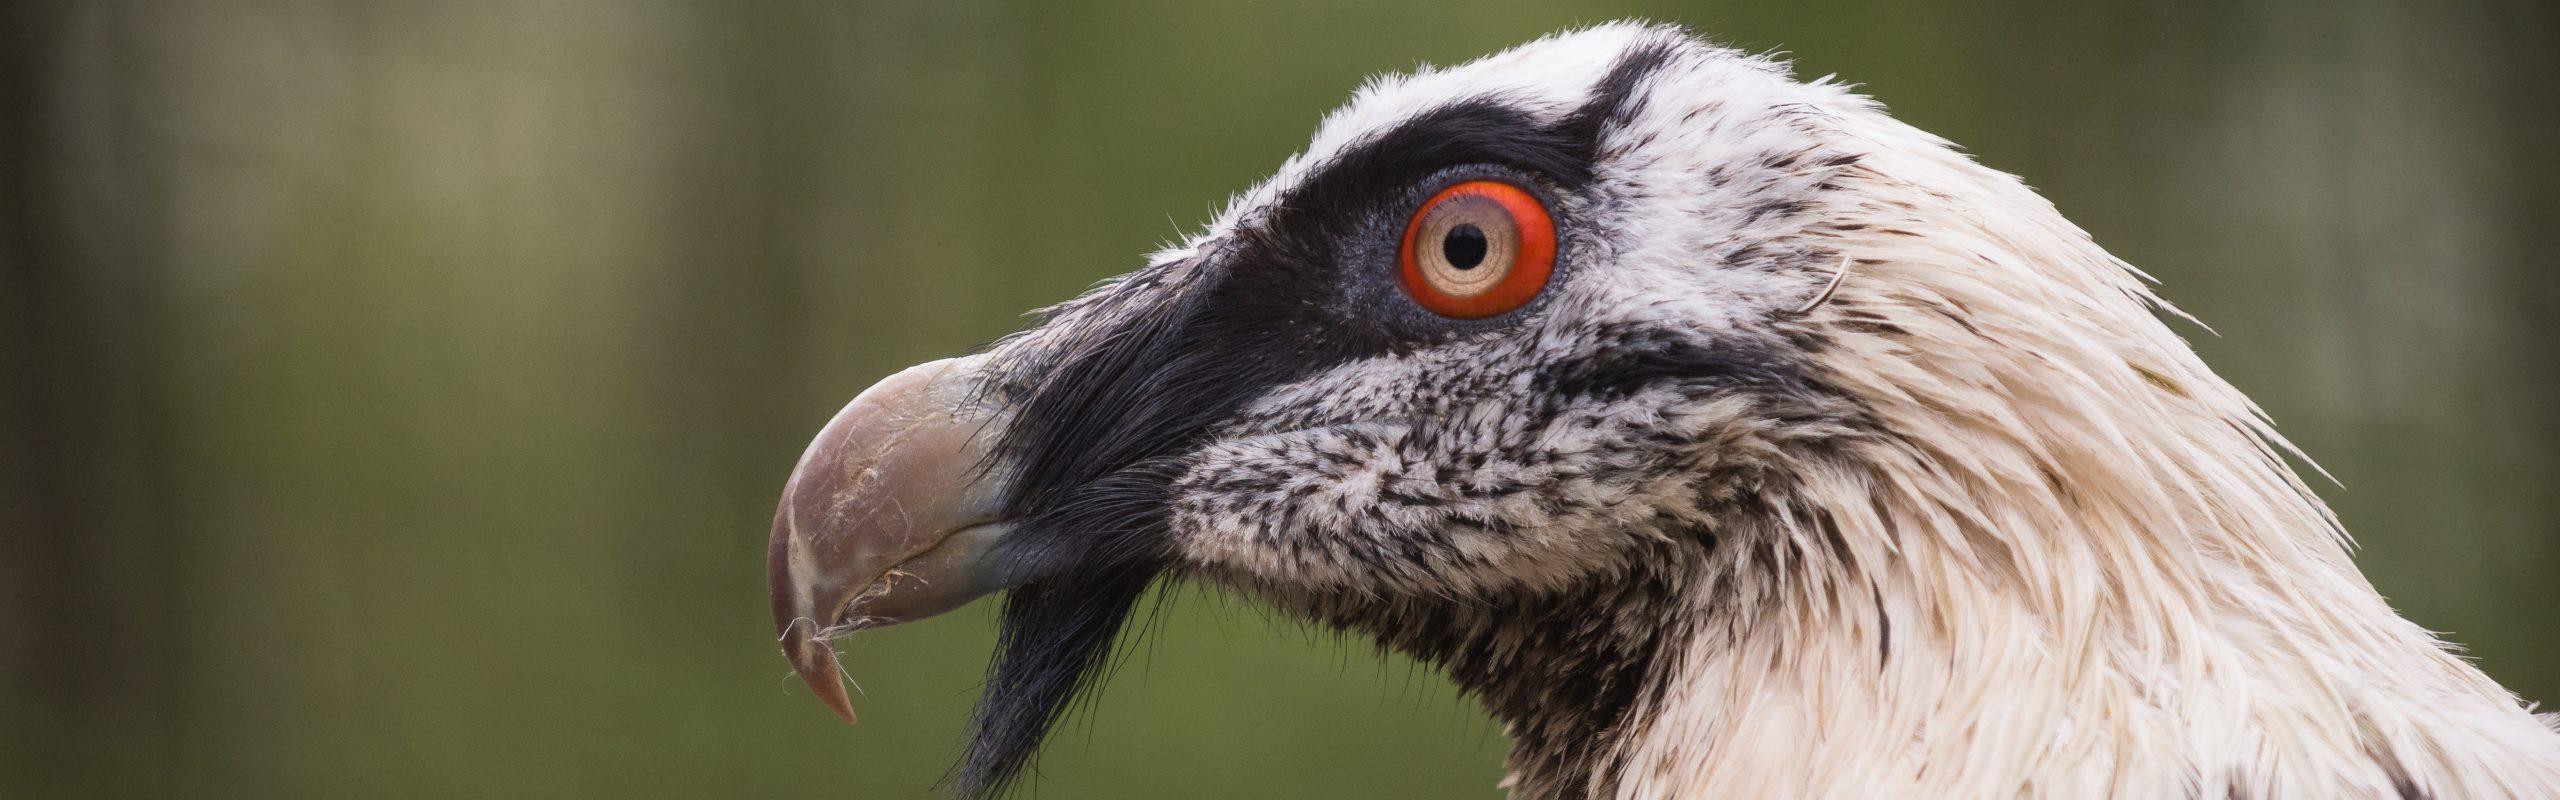 https://faunafocus.com/home/may-2018-bearded-vulture/#jp-carousel-7908